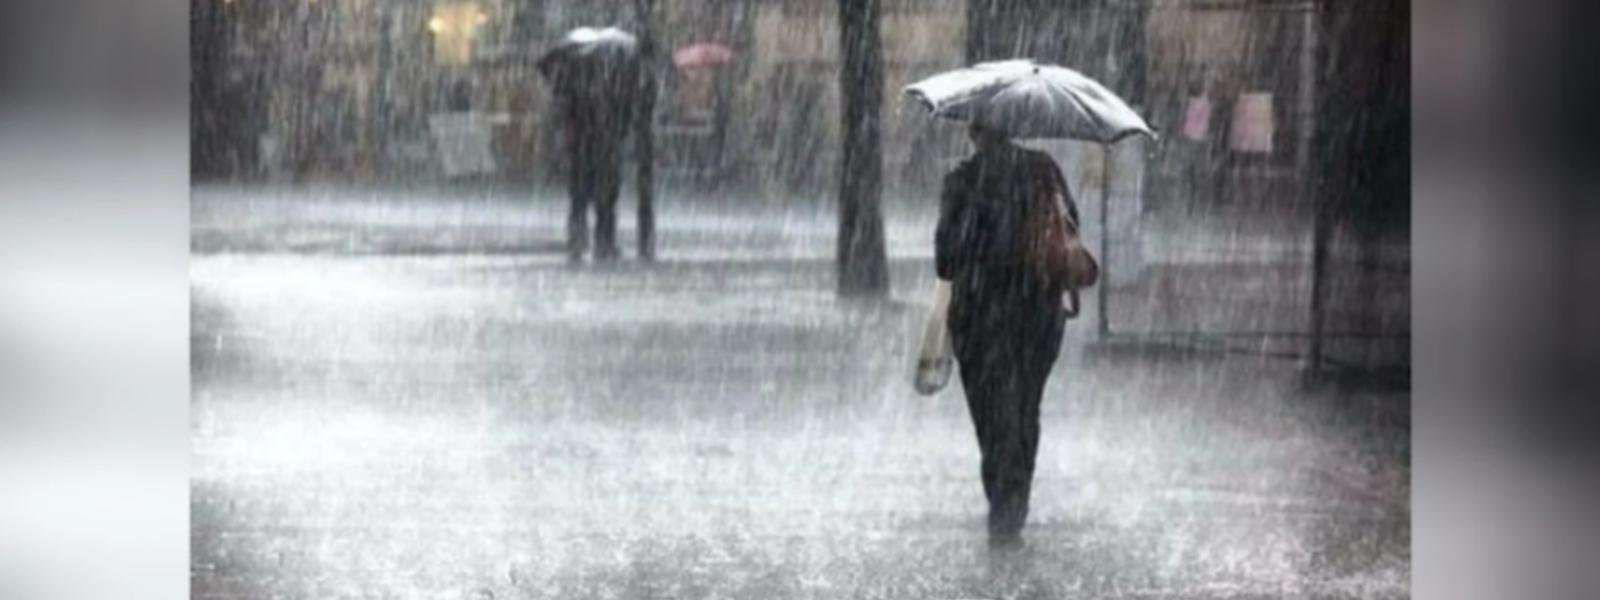 Heavy showers exceeding 100 mm likely today (21): Met. Department